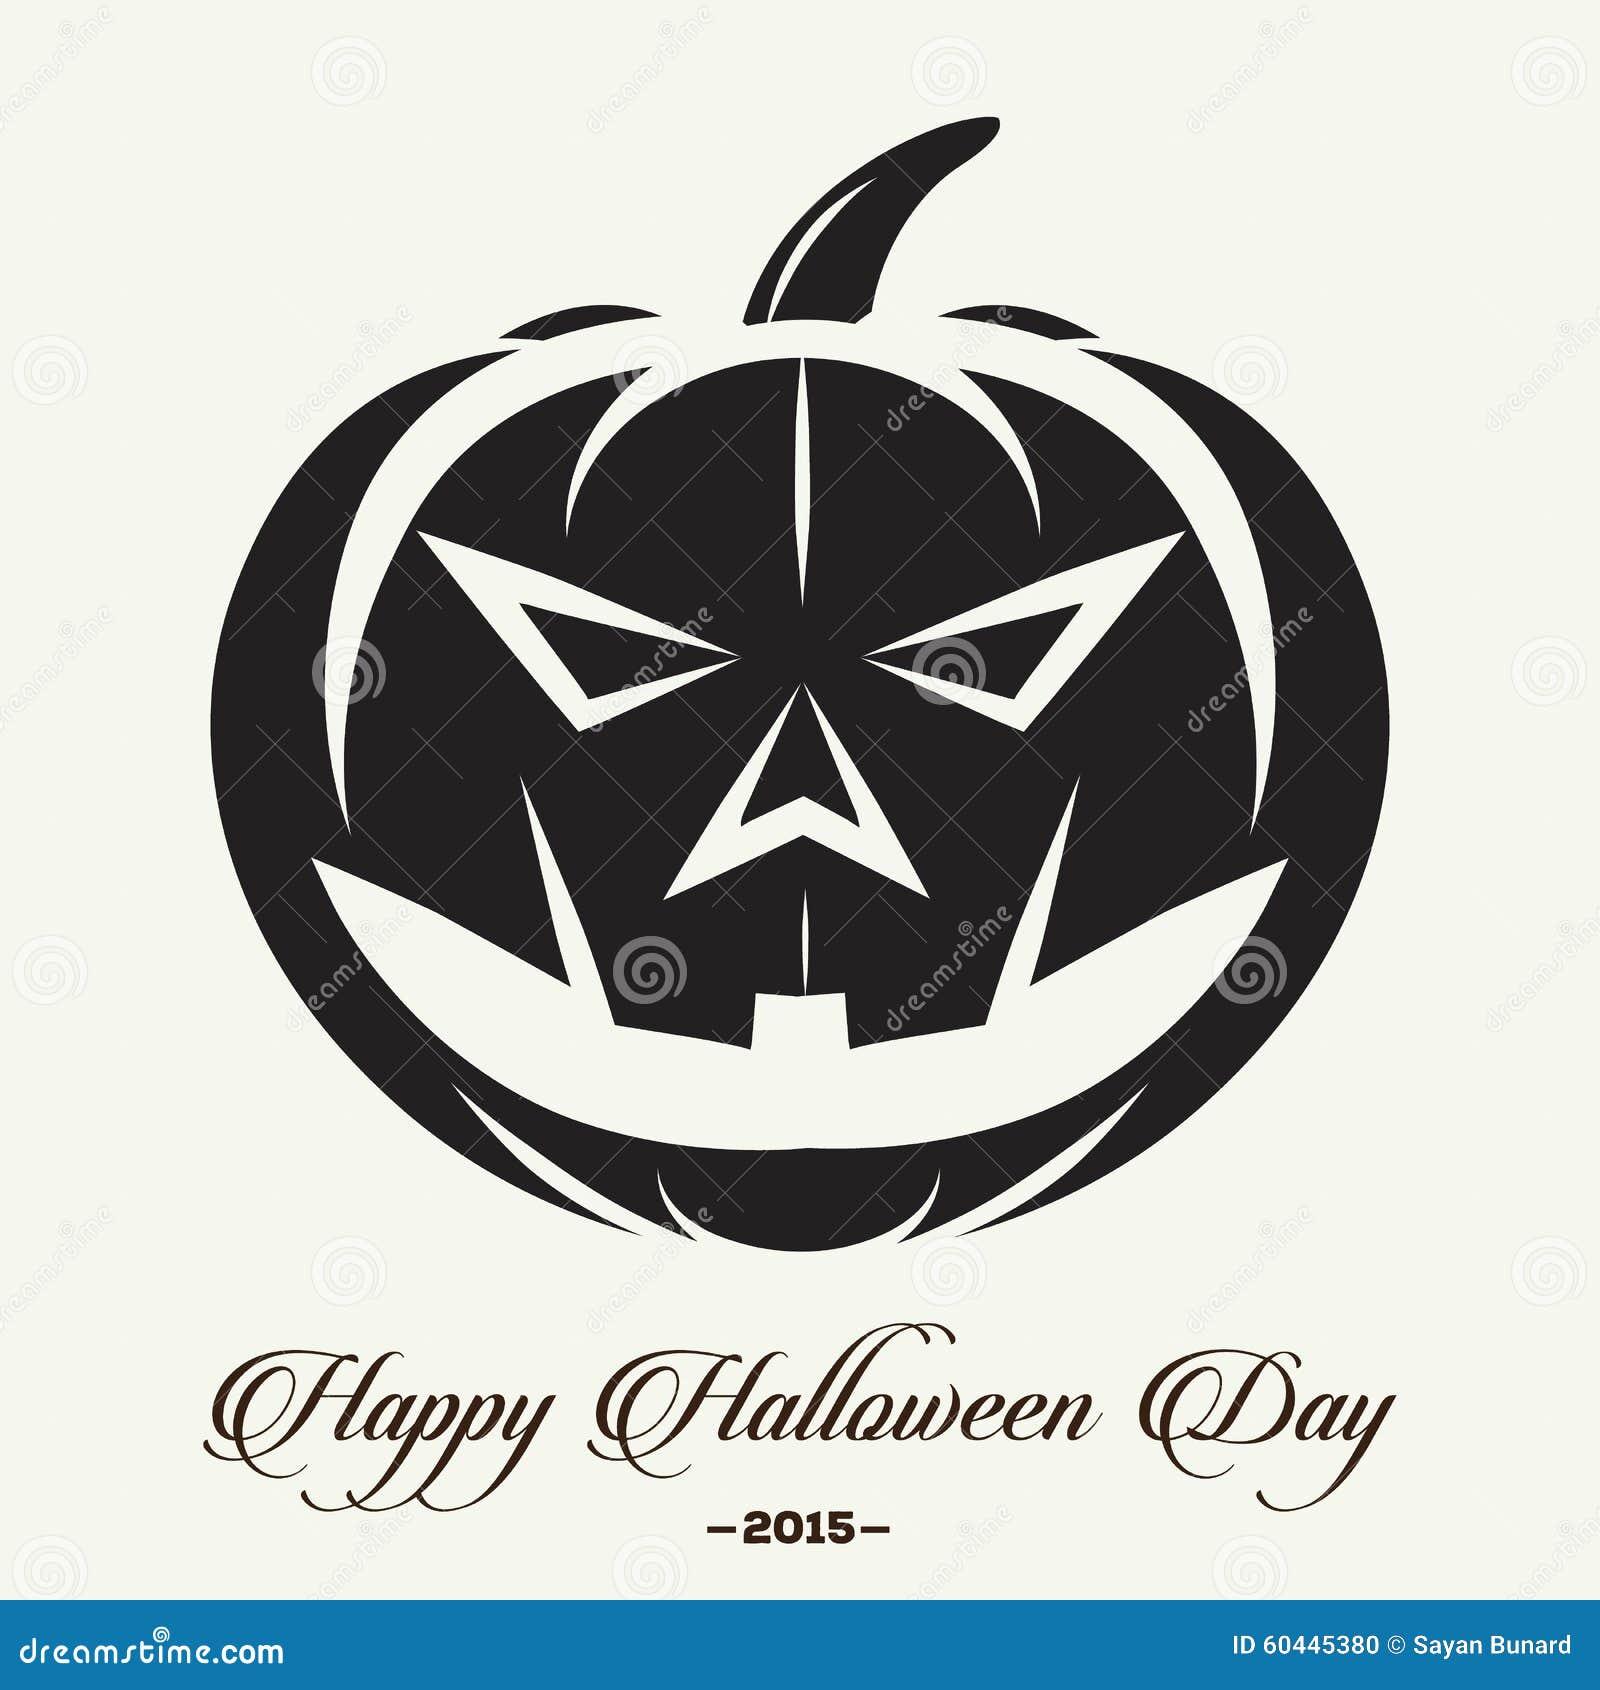 halloween logo stock illustration image 60445380 pumpkin clip art images of cow pumpkin clipart images in black and white